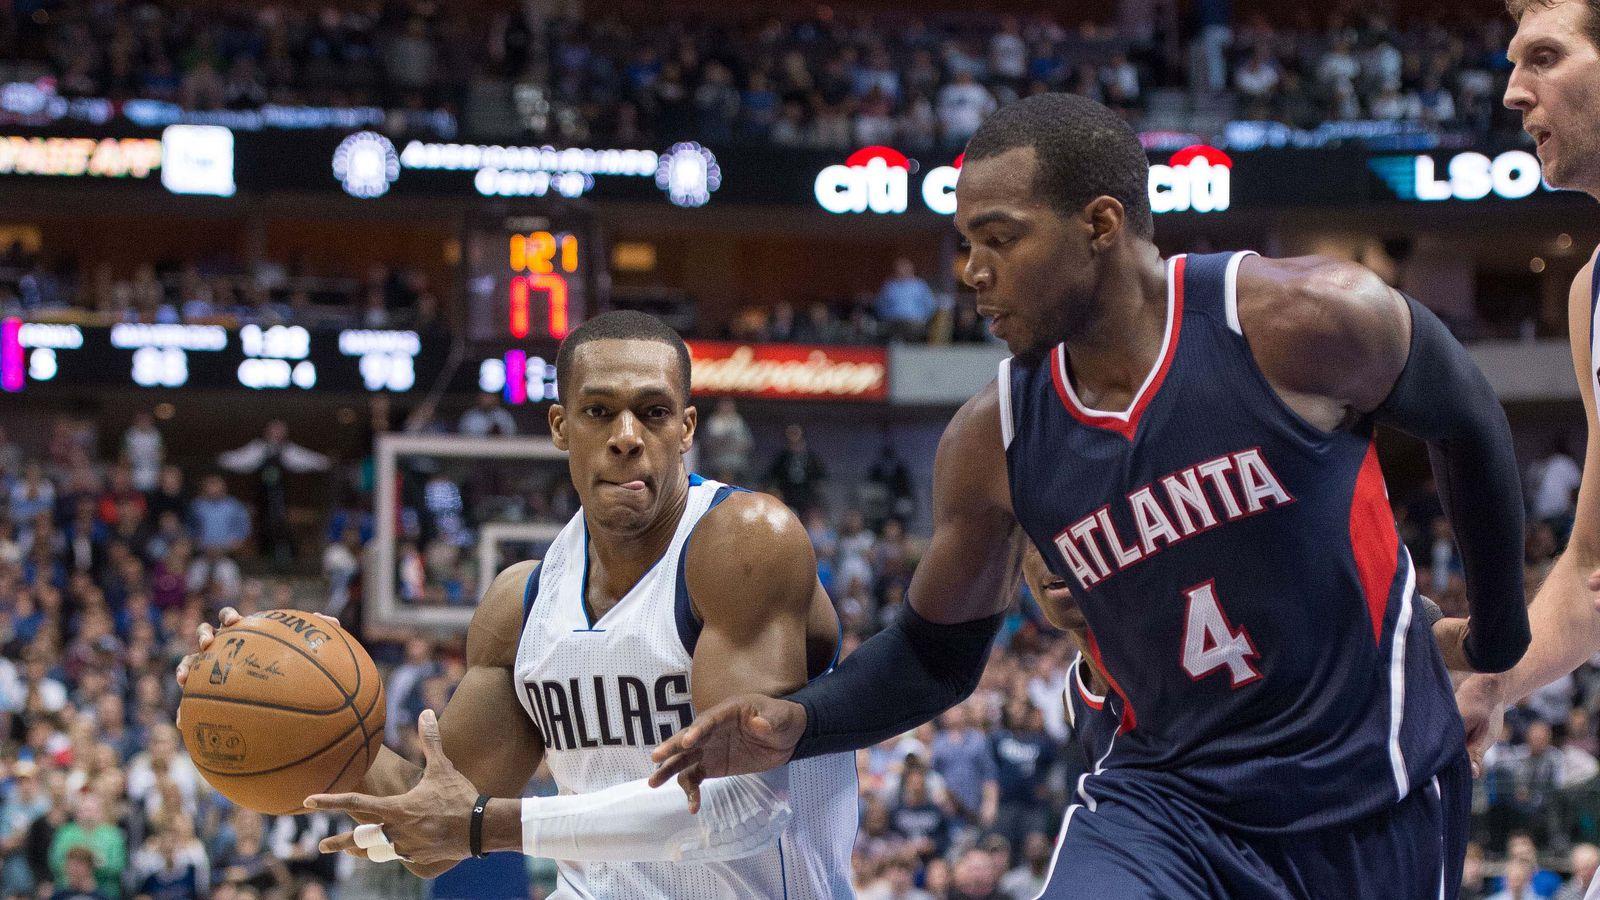 Mavs vs Hawks preview: Atlanta faces tough test